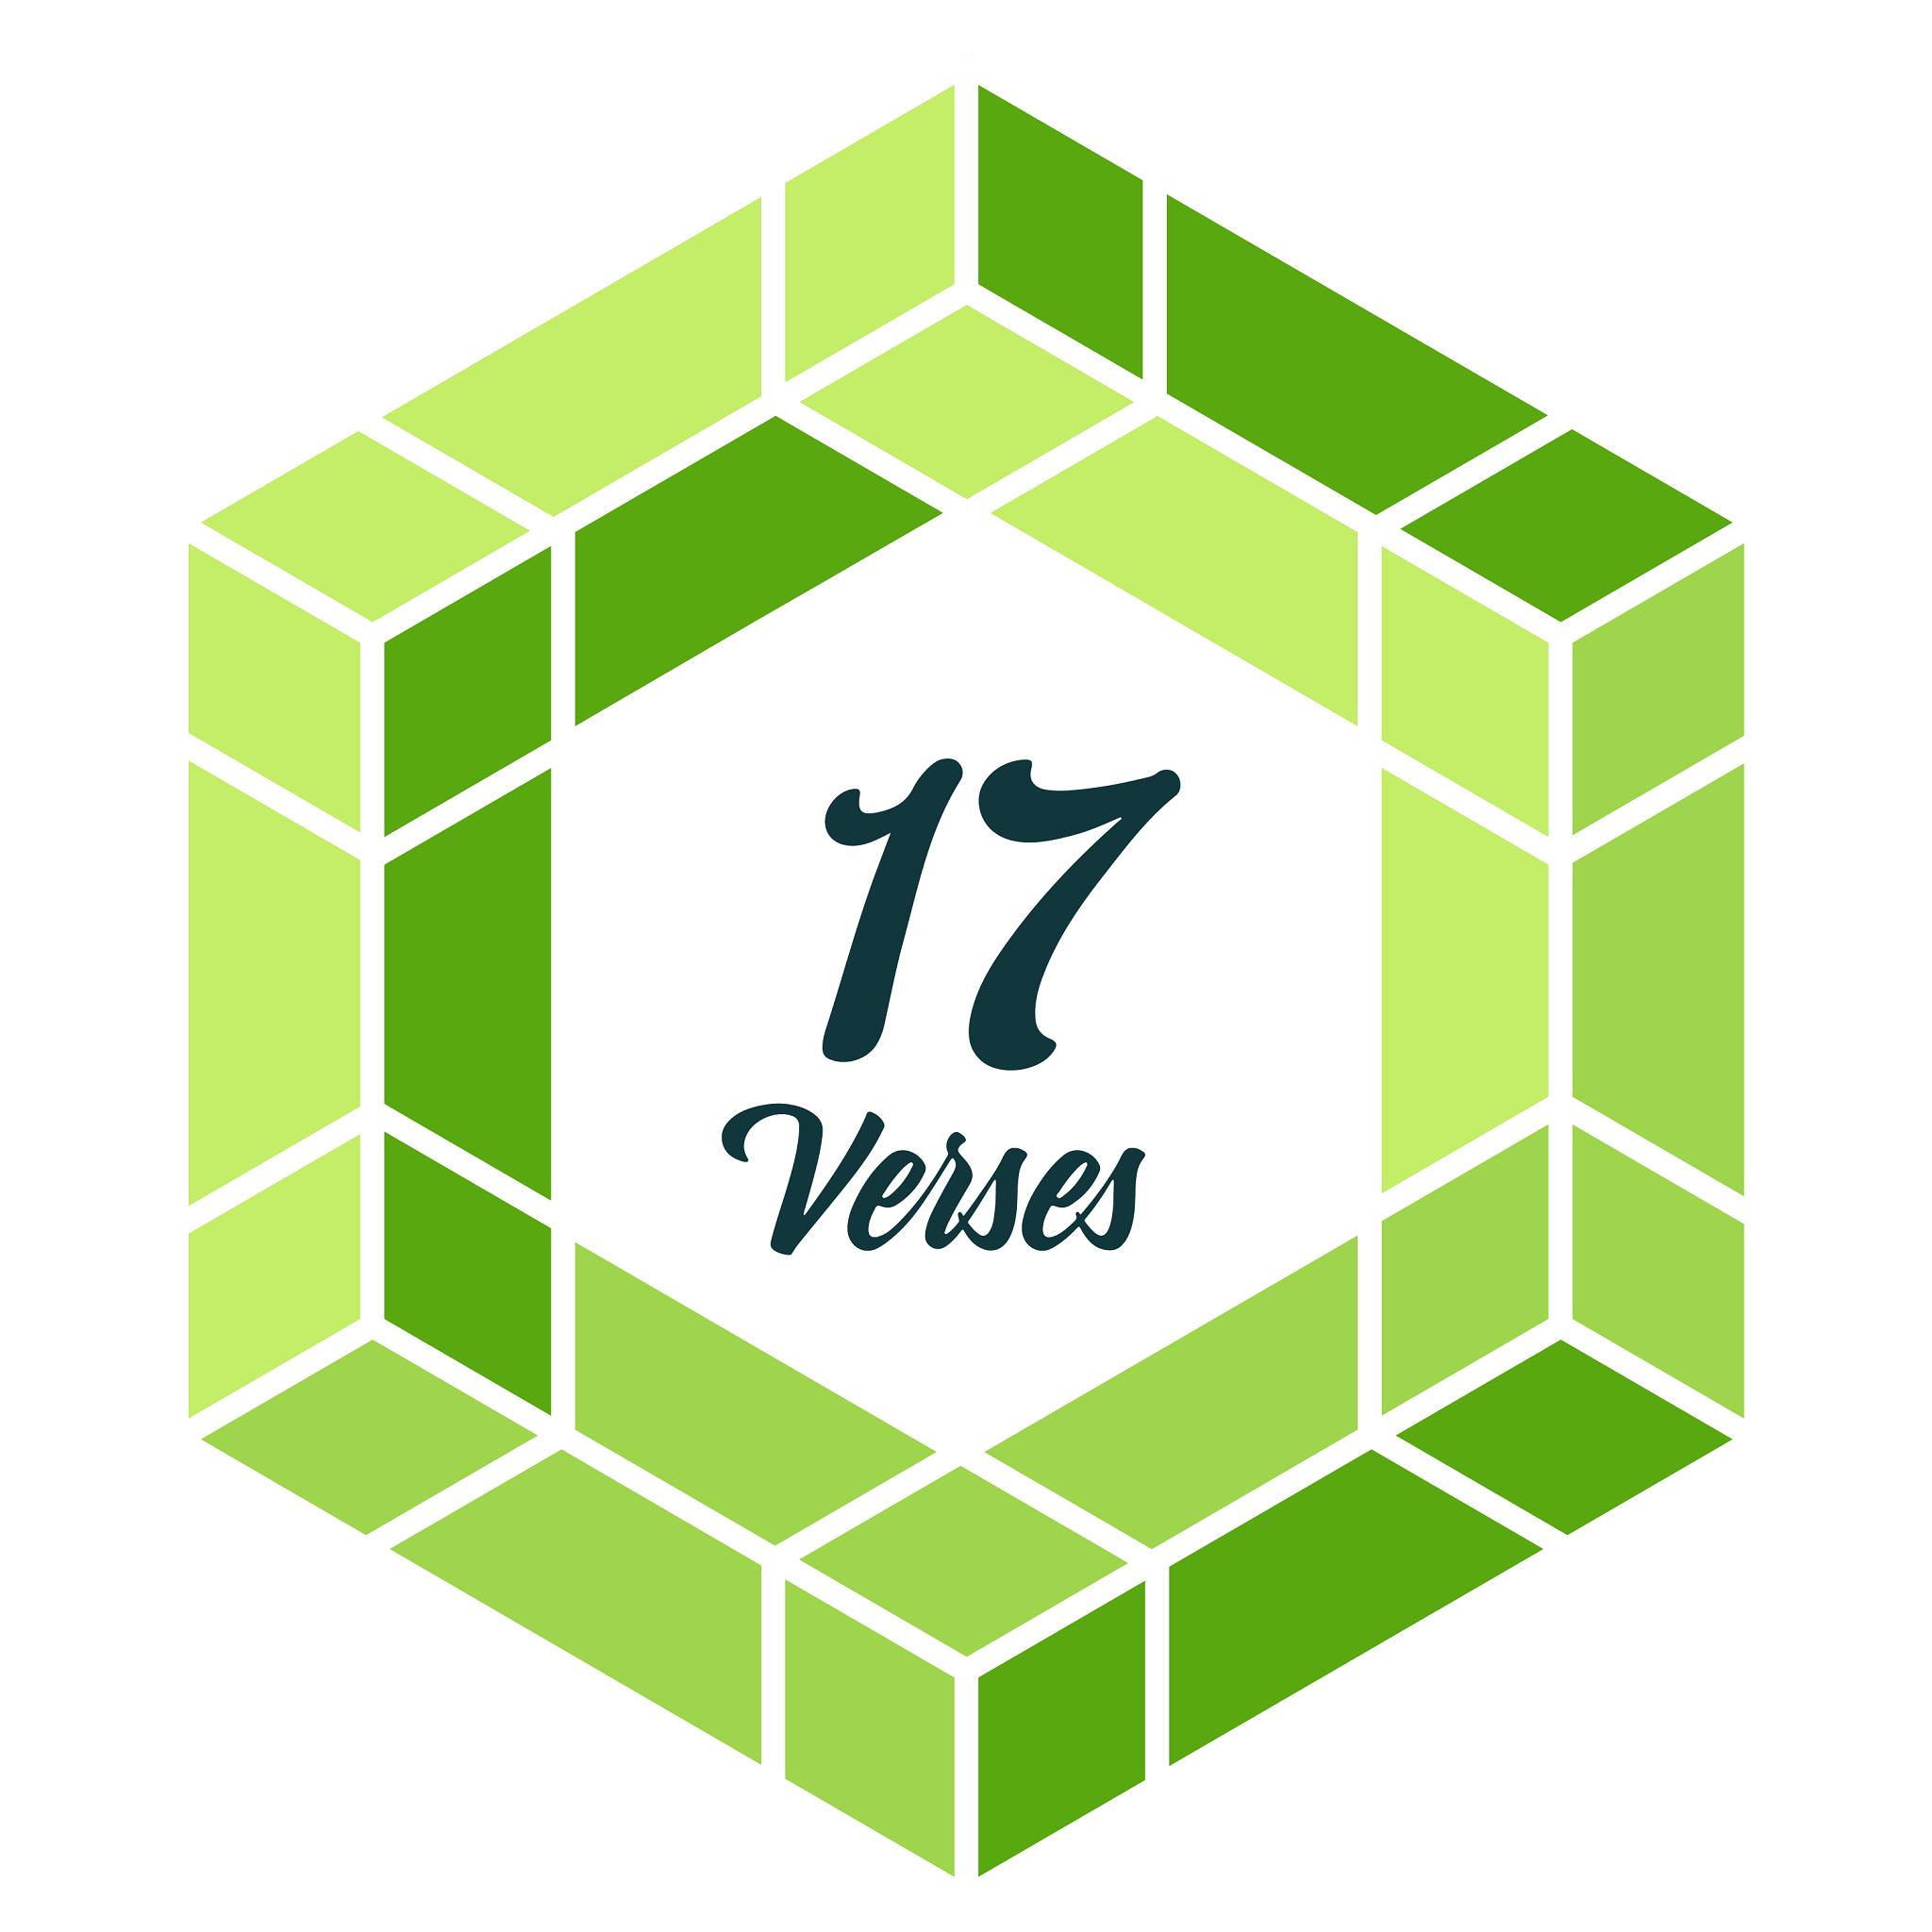 Year 2 - Surah 11 (Hüd), Verses 50-68